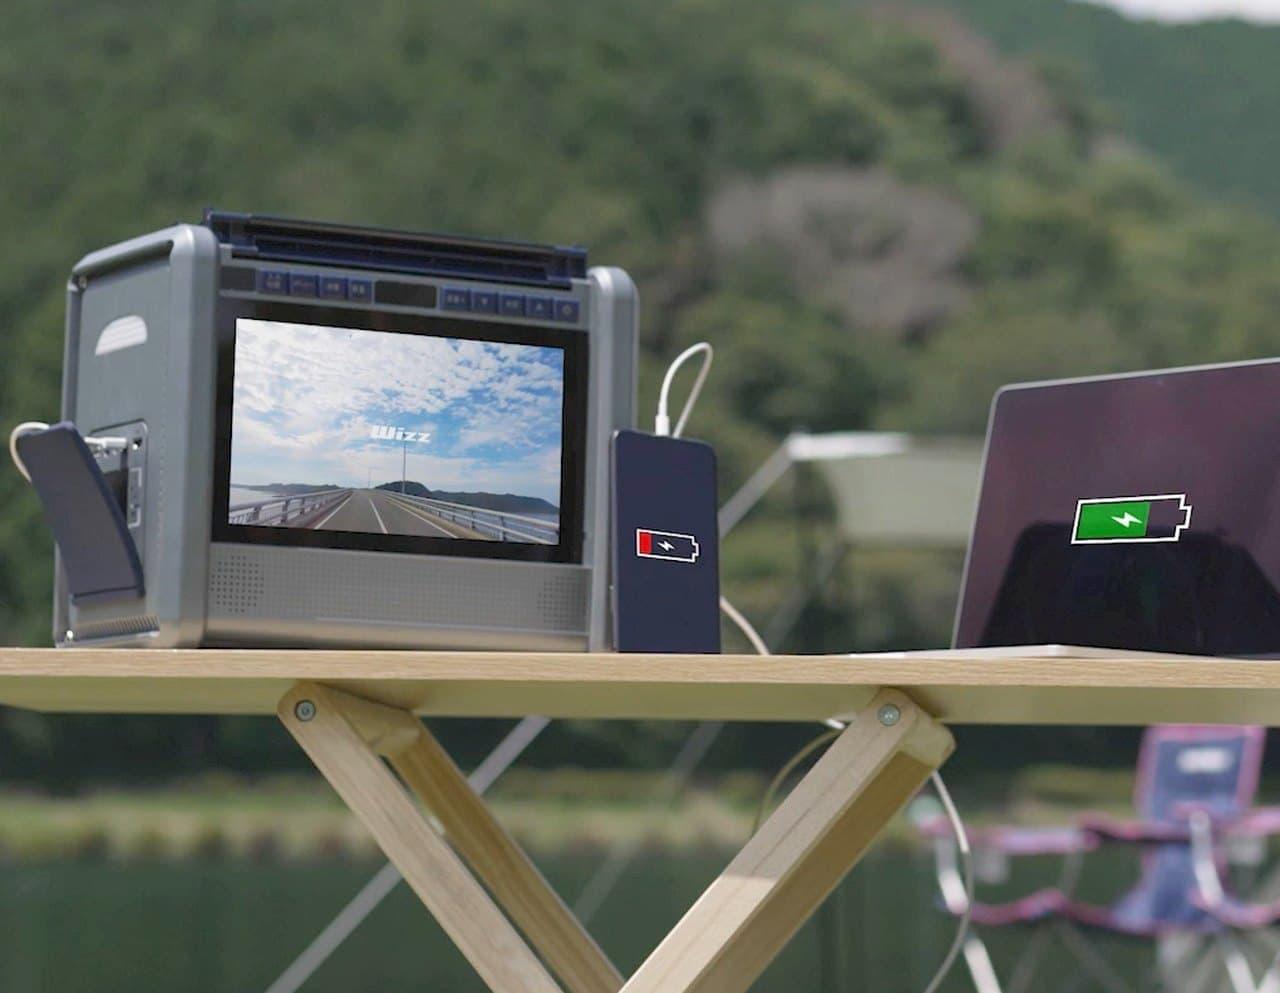 TV搭載でキャンプ場でゲームもできる!ポータブル電源「Power Station TV」